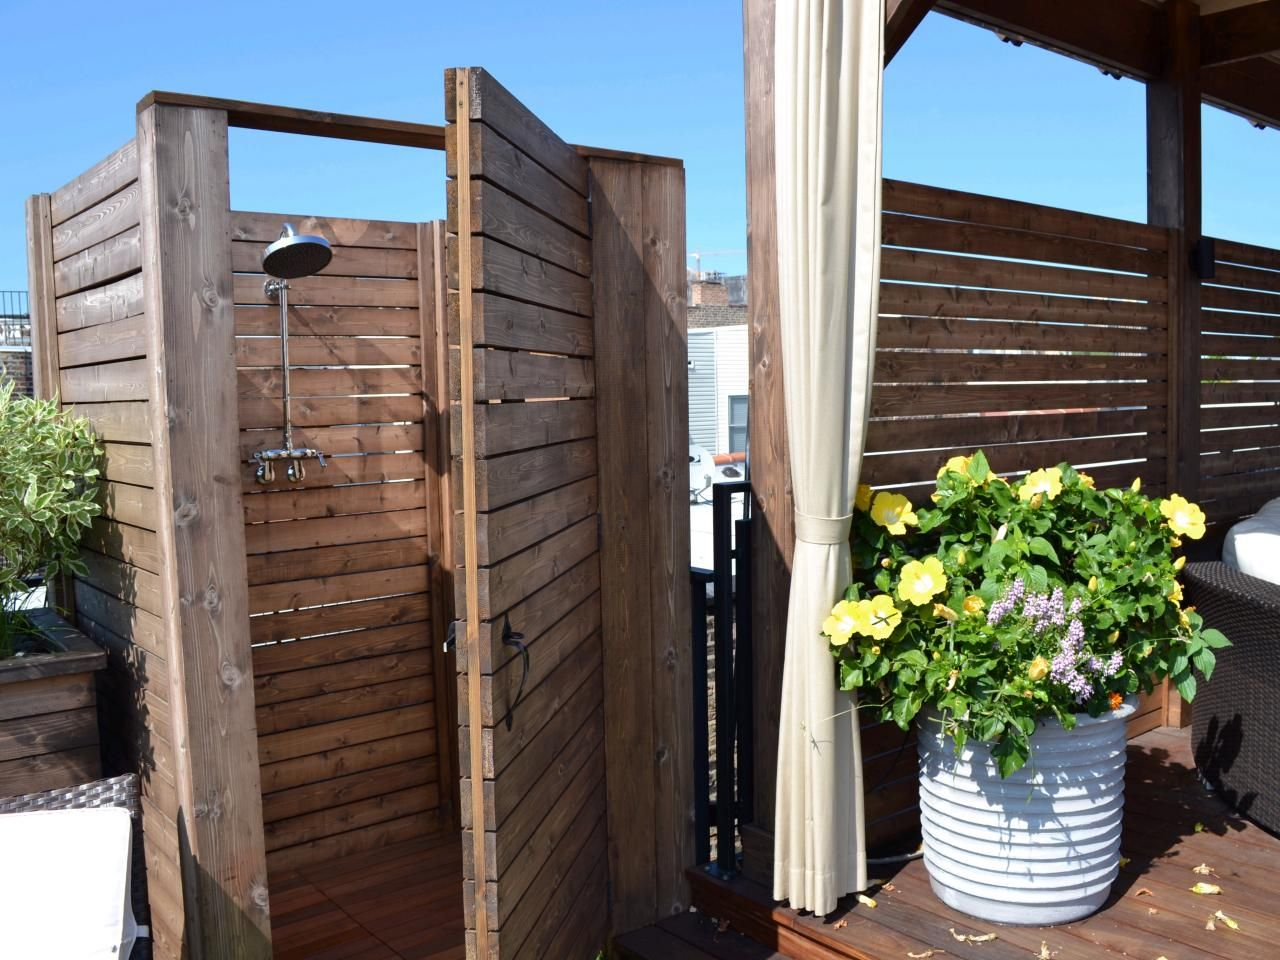 Ideas For Outdoor Showers Part - 41: Design Ideas: Outdoor Showers And Tubs | Outdoor Spaces - Patio Ideas,  Decks U0026